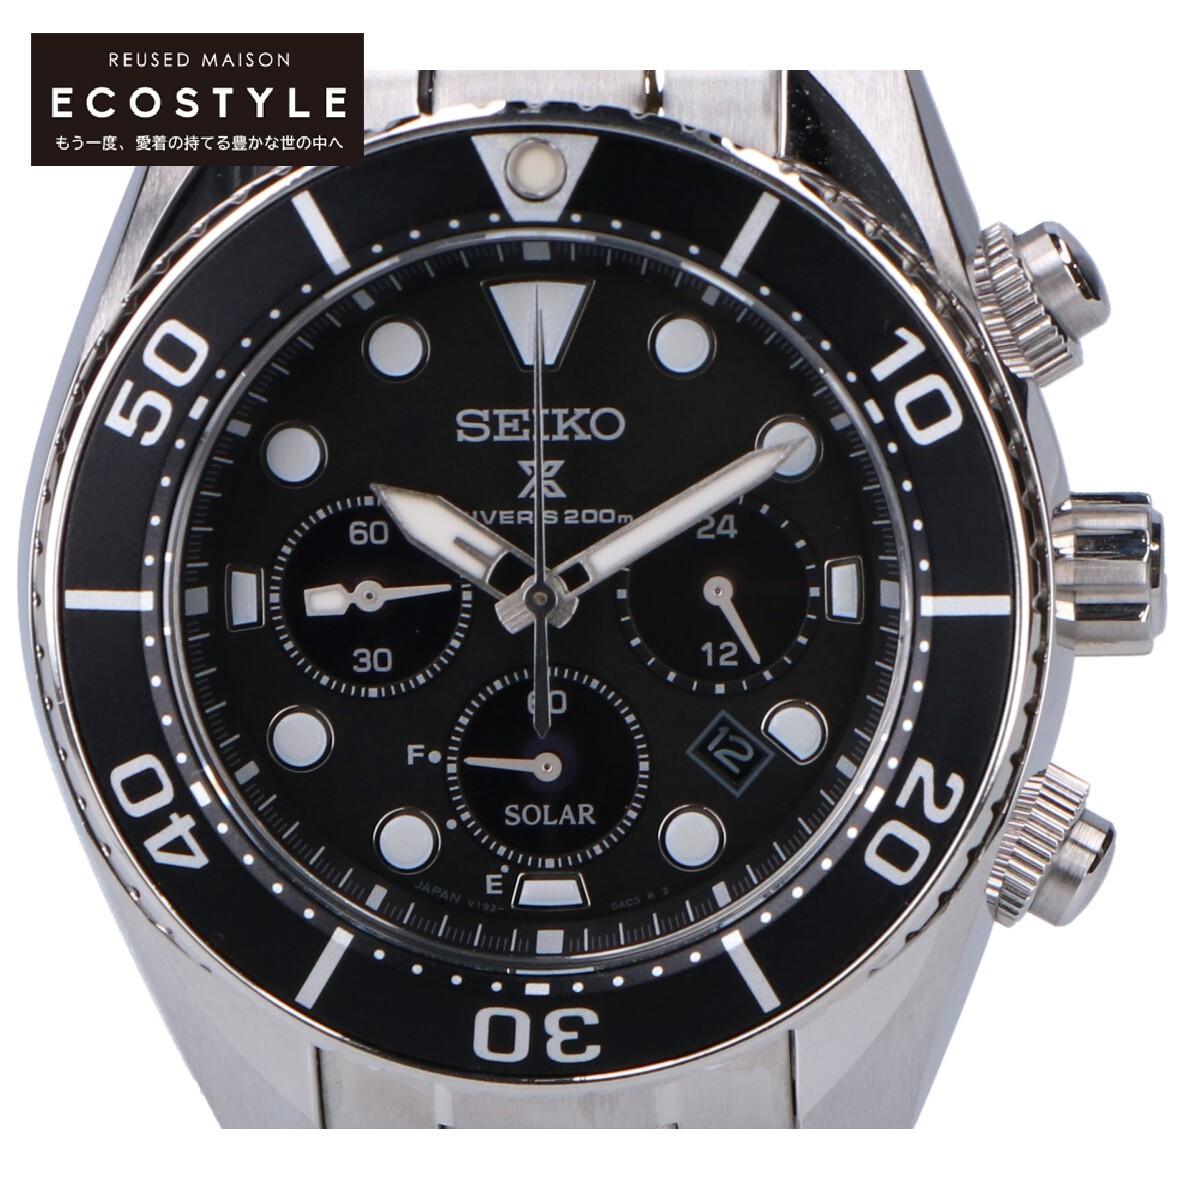 SEIKO 受賞店 セイコー SBDL061 プロスペックス ダイバーズウオッチ ソーラー 中古 日時指定 腕時計 シルバー メンズ ブラック